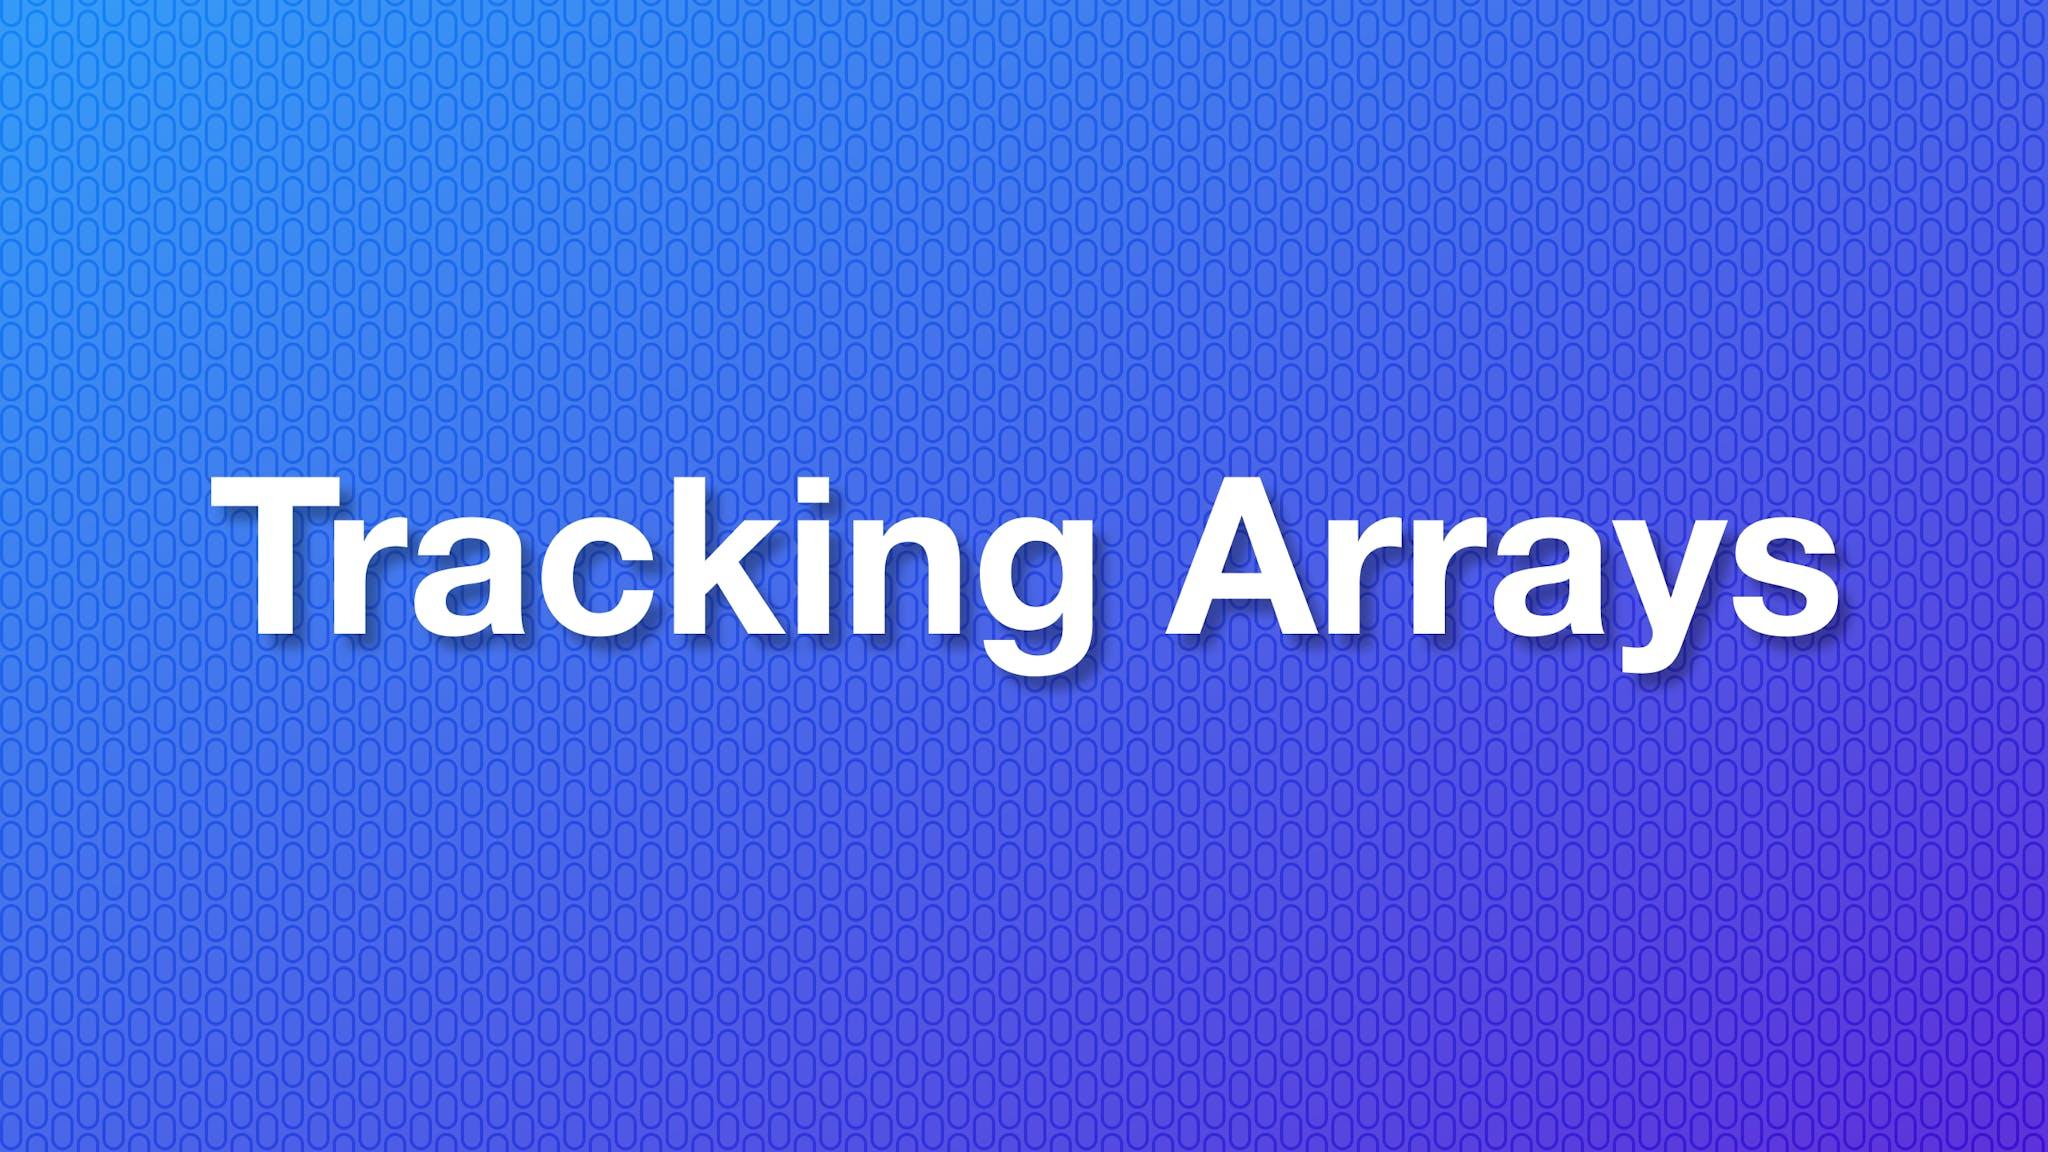 Tracking Arrays